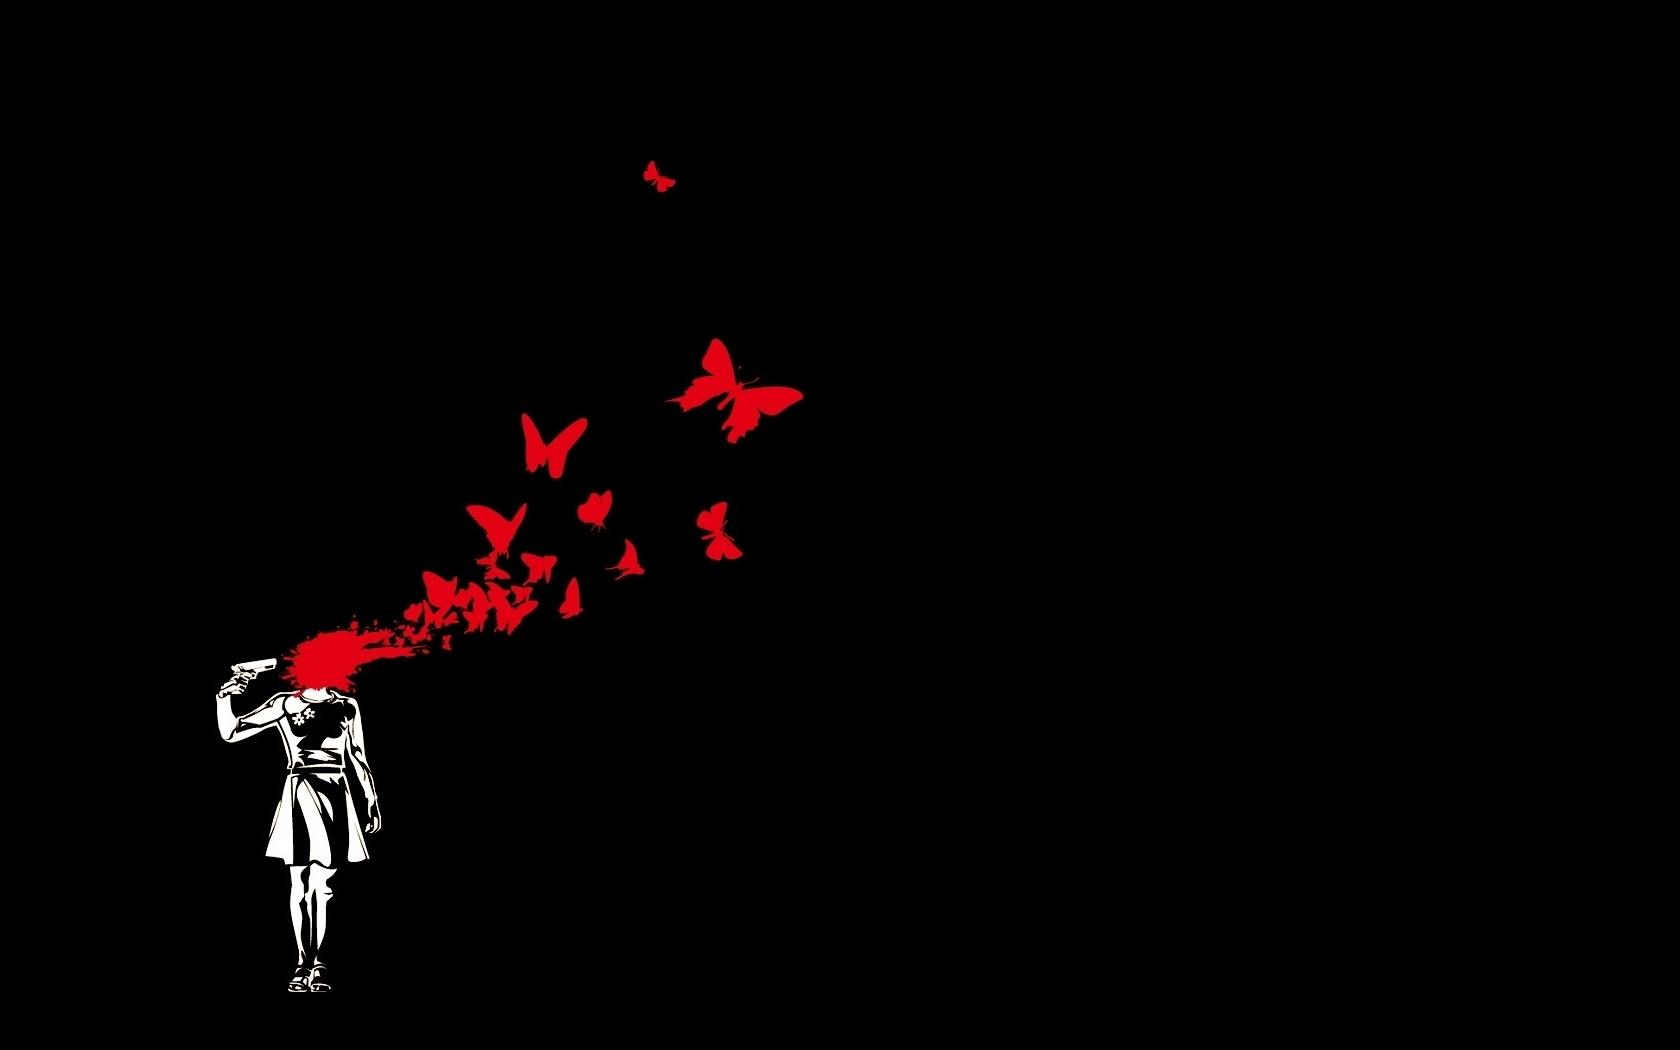 anime black background hd